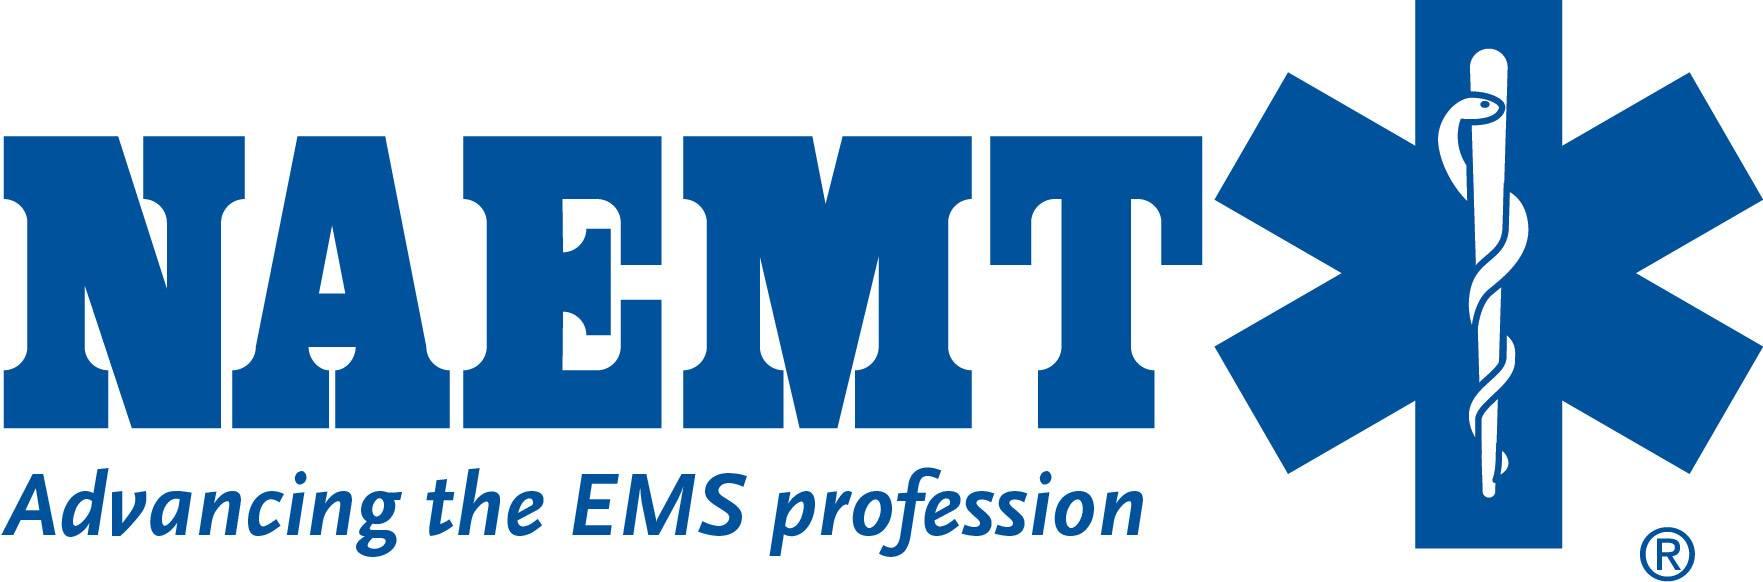 Logo of National Association of Emergency Medical Technicians (NAEMT)